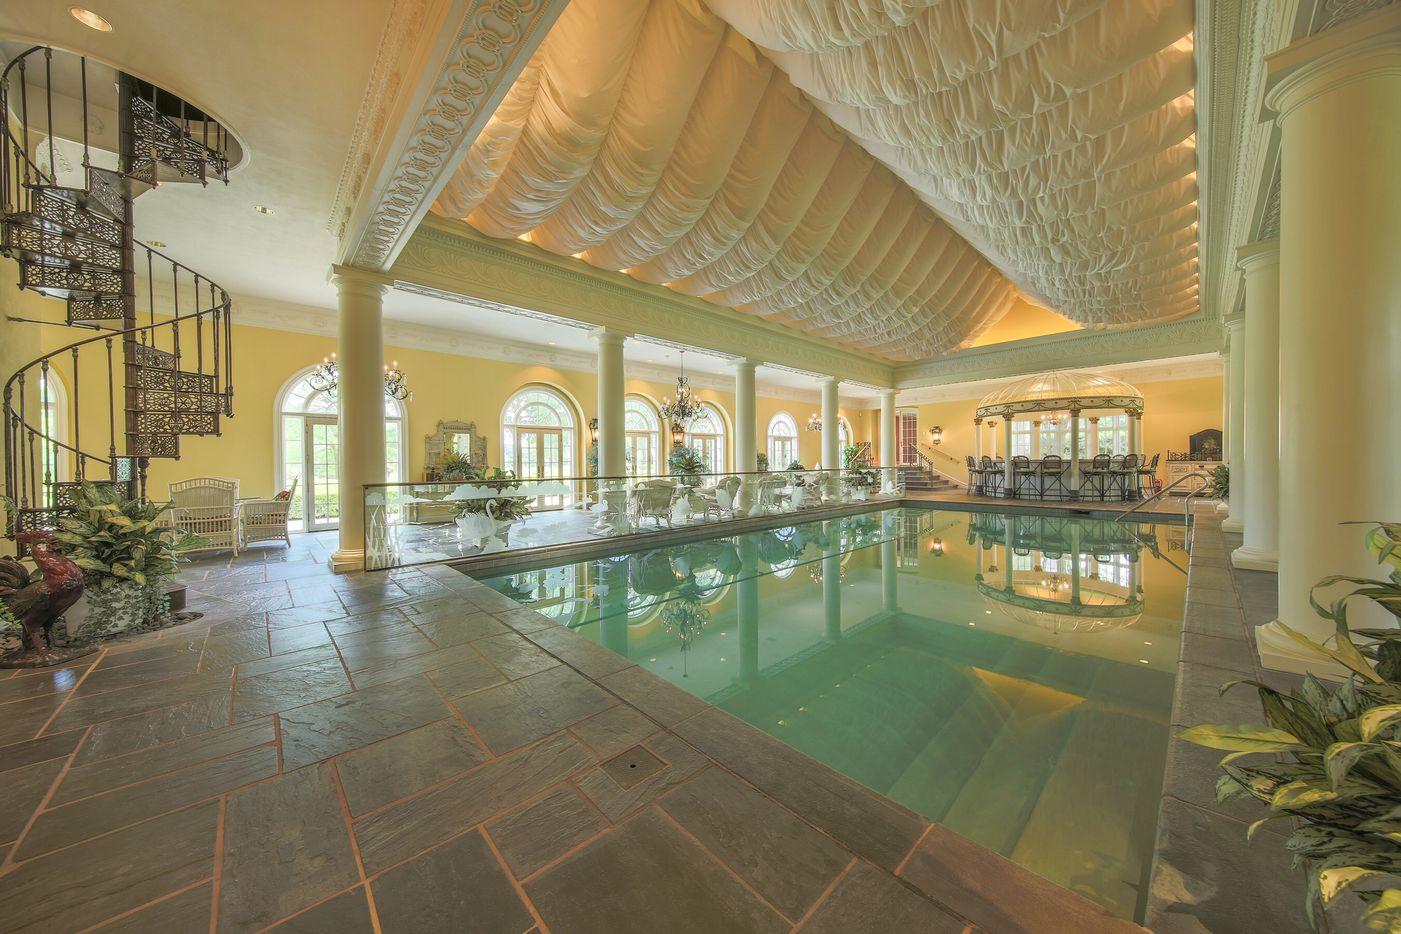 The Pilgrim estate includes a huge indoor pool.